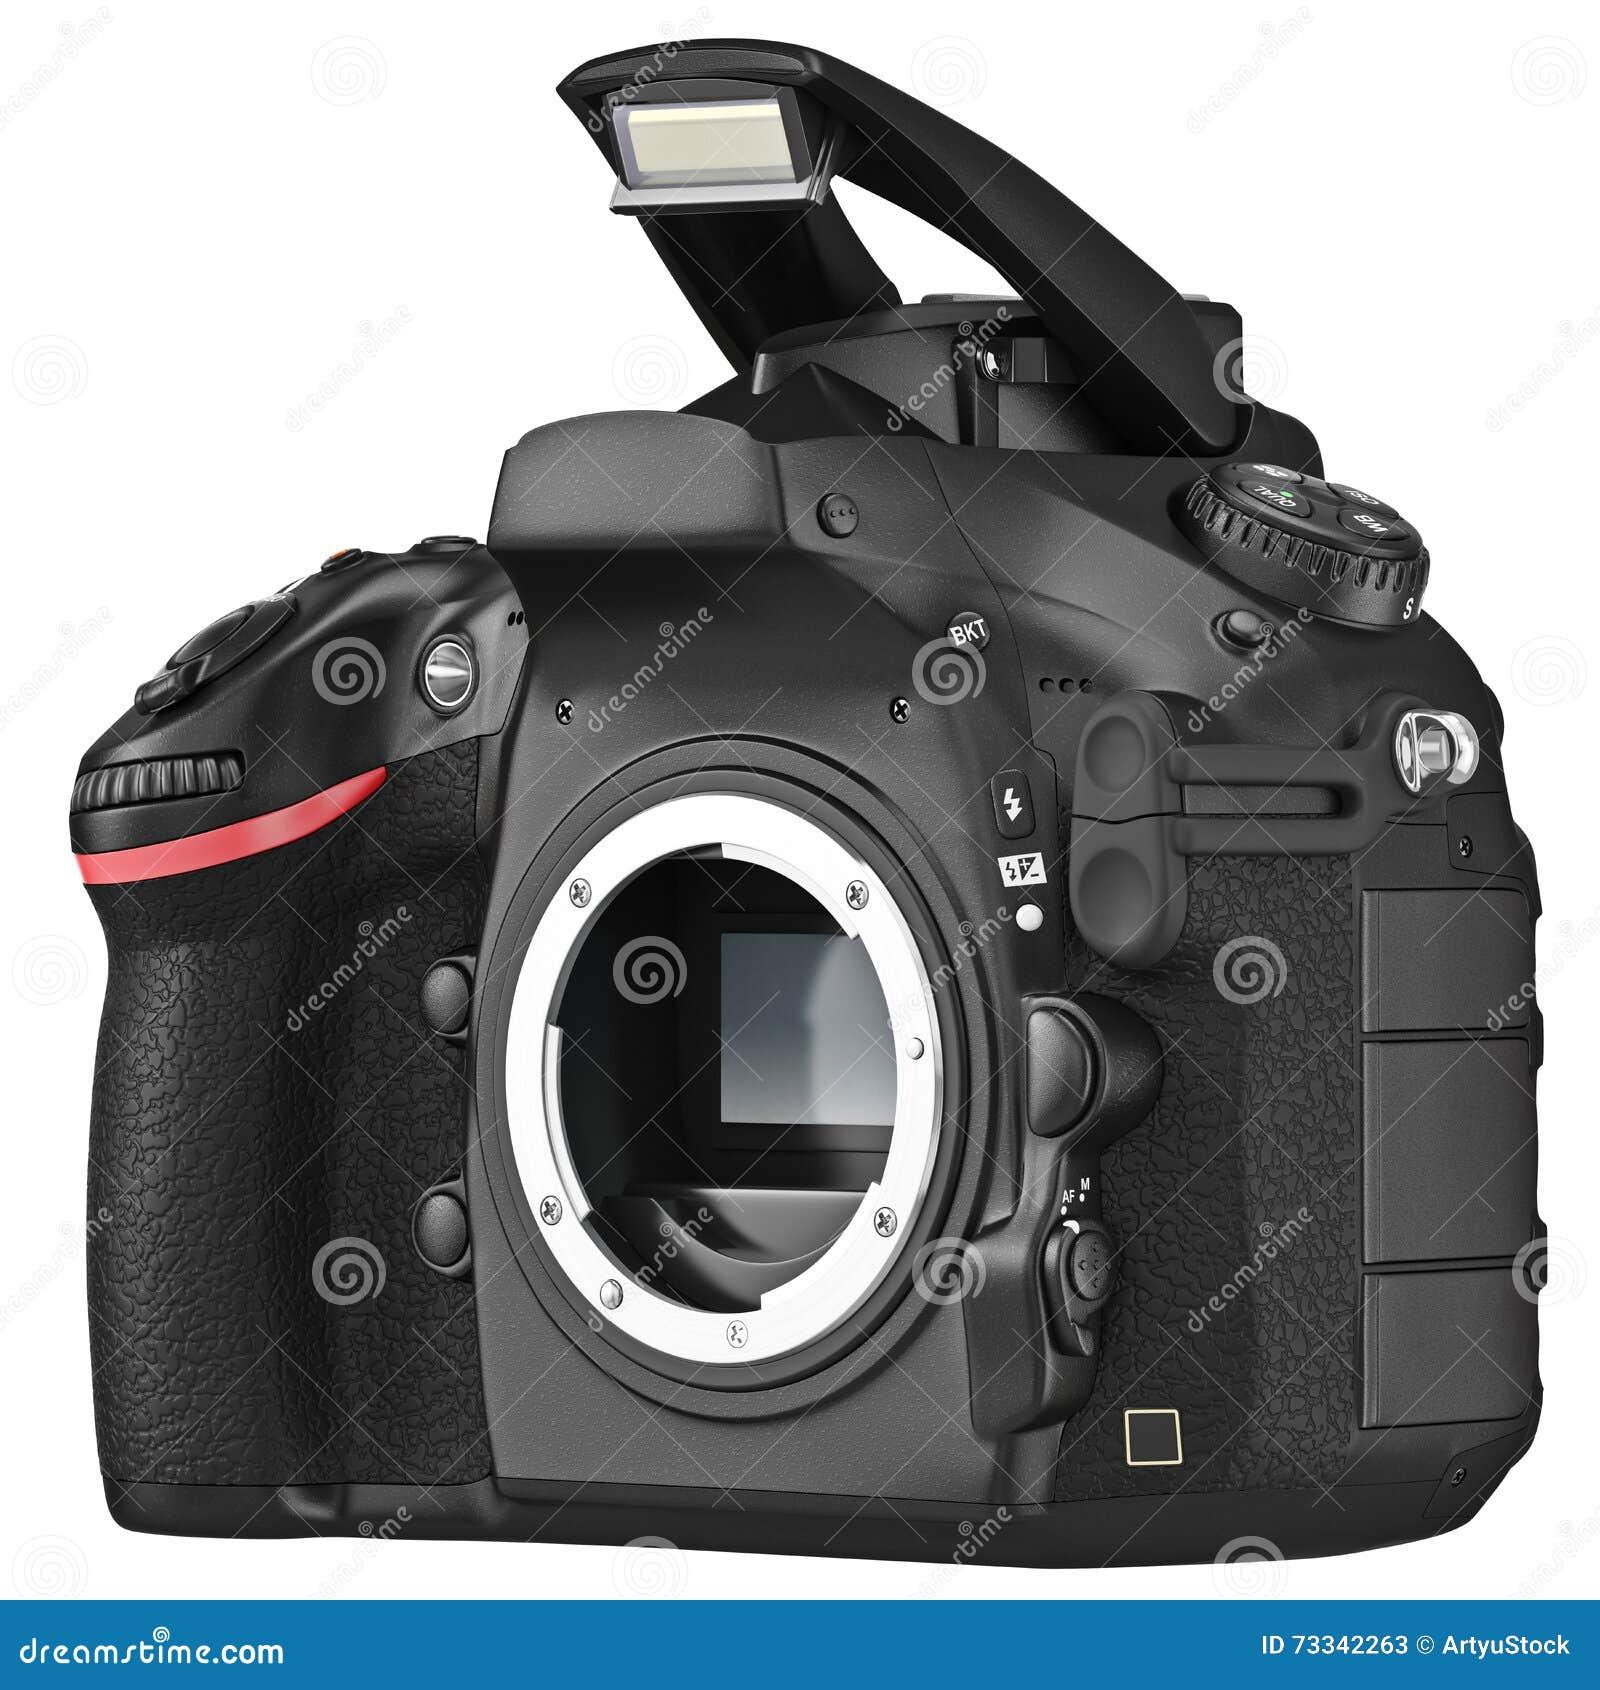 Camera Dslr Camera Without Lens dslr camera without lens open flash stock illustration image flash